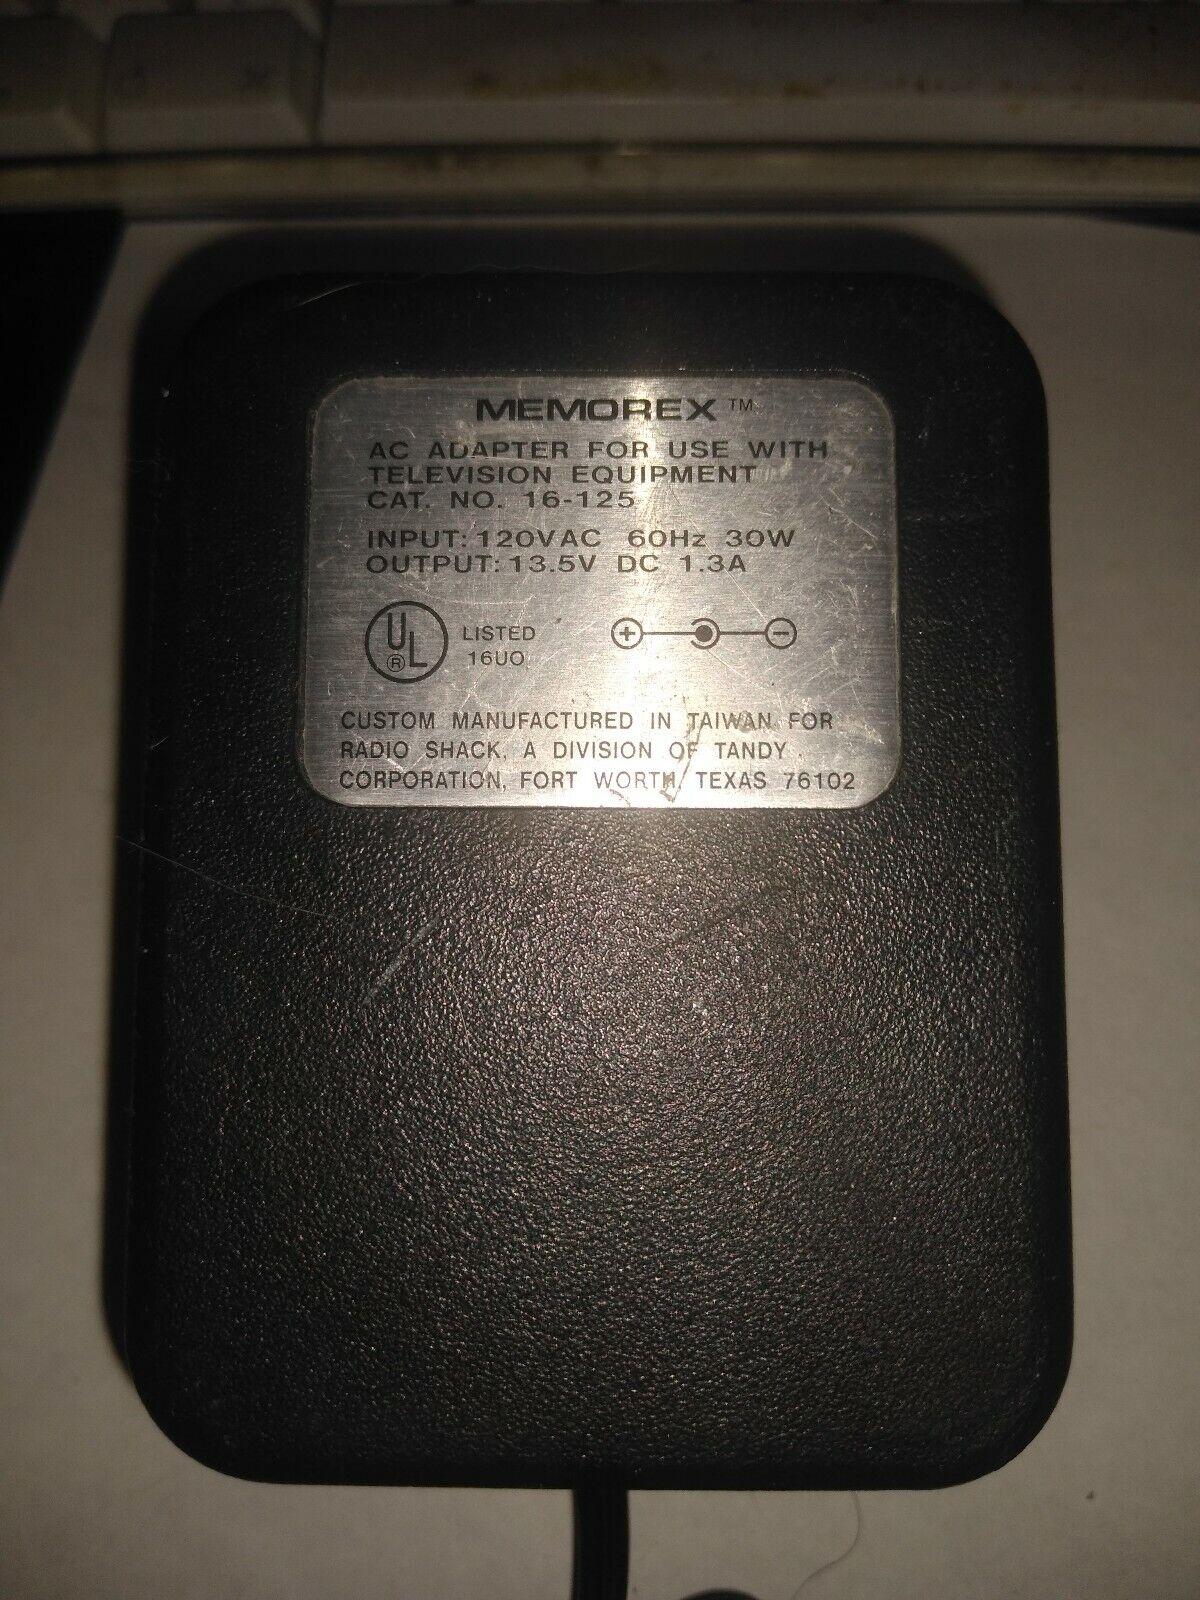 (CB) Memorex adapter 16-125 13.5V DC 1.3A Free US Shipping